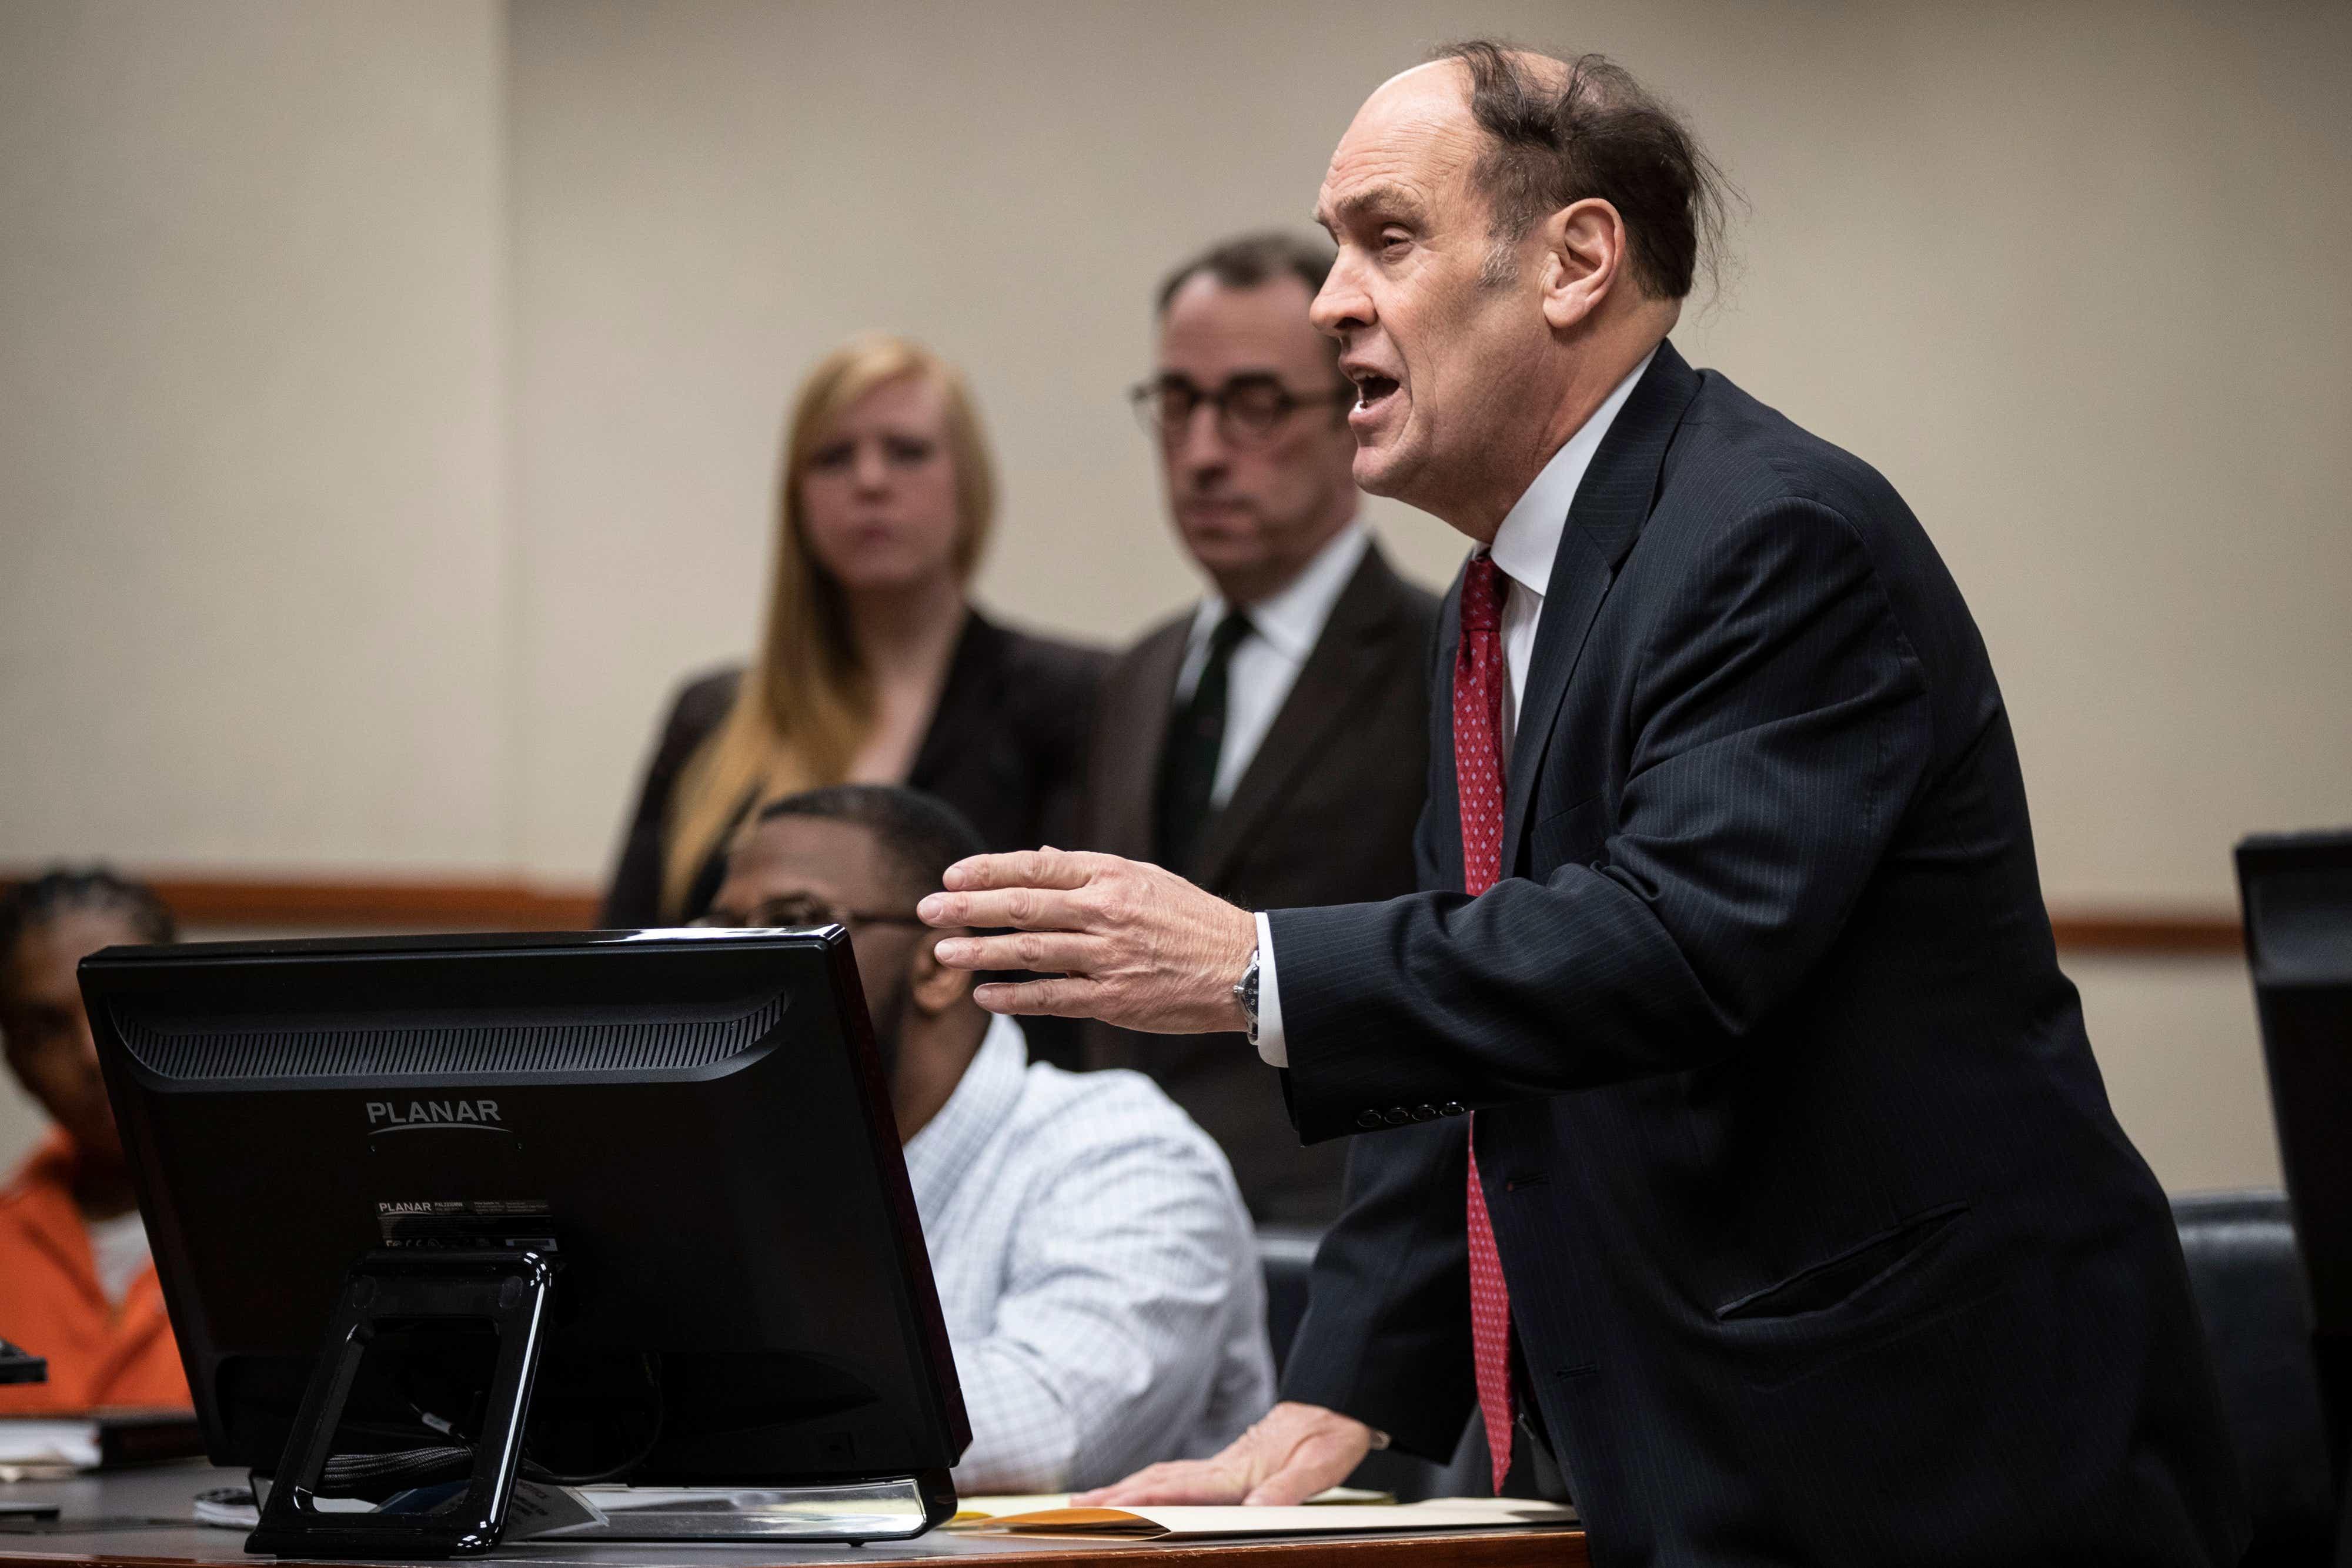 Watch famed Kentucky criminal defense lawyer Rob Eggert in action